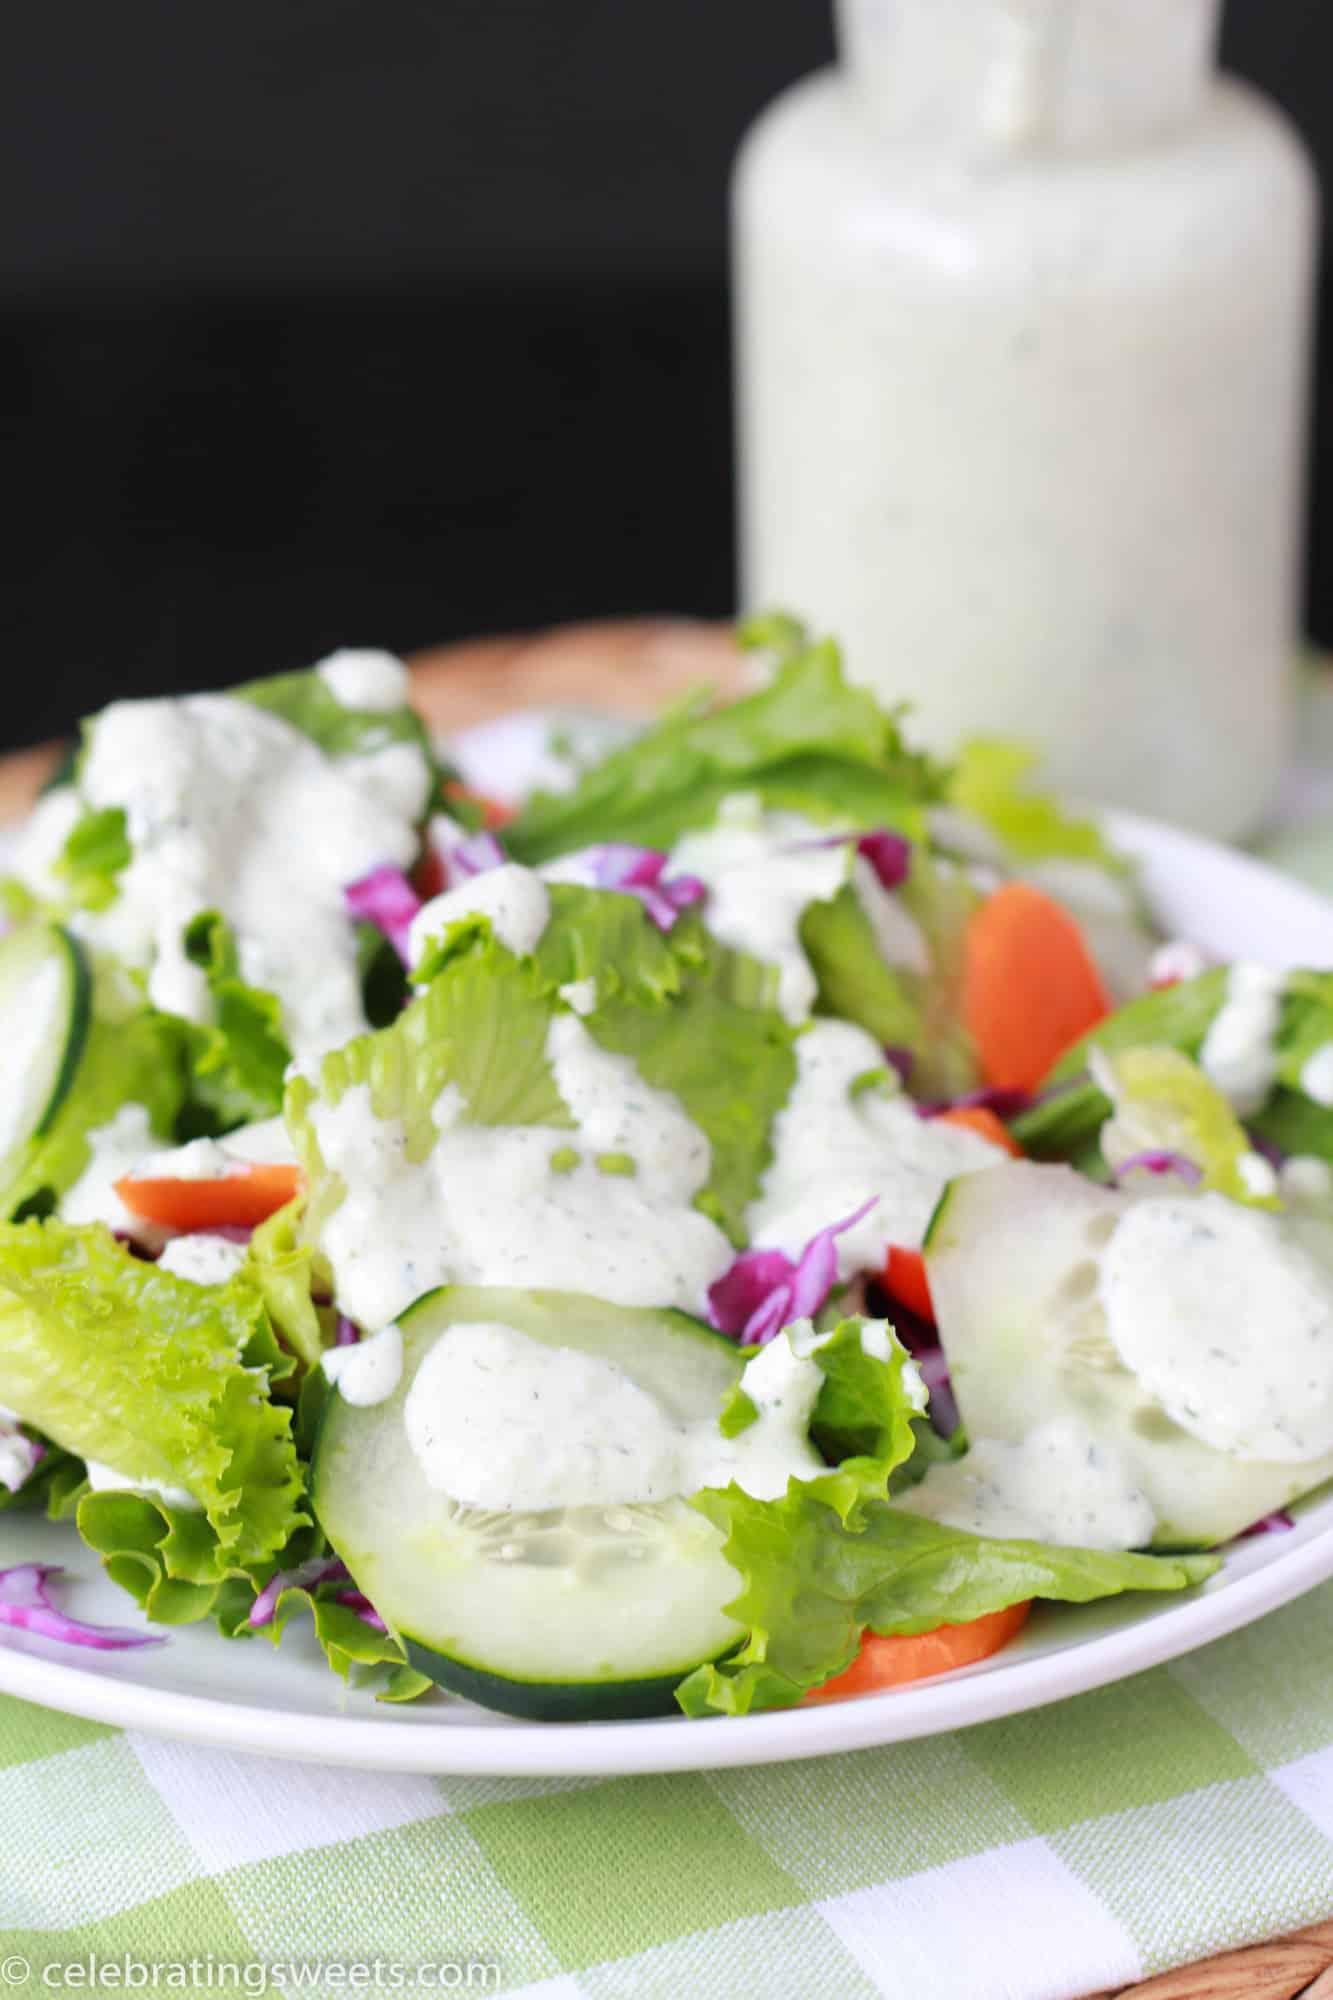 Creamy Herb & Cucumber Dressing | Celebrating Sweets